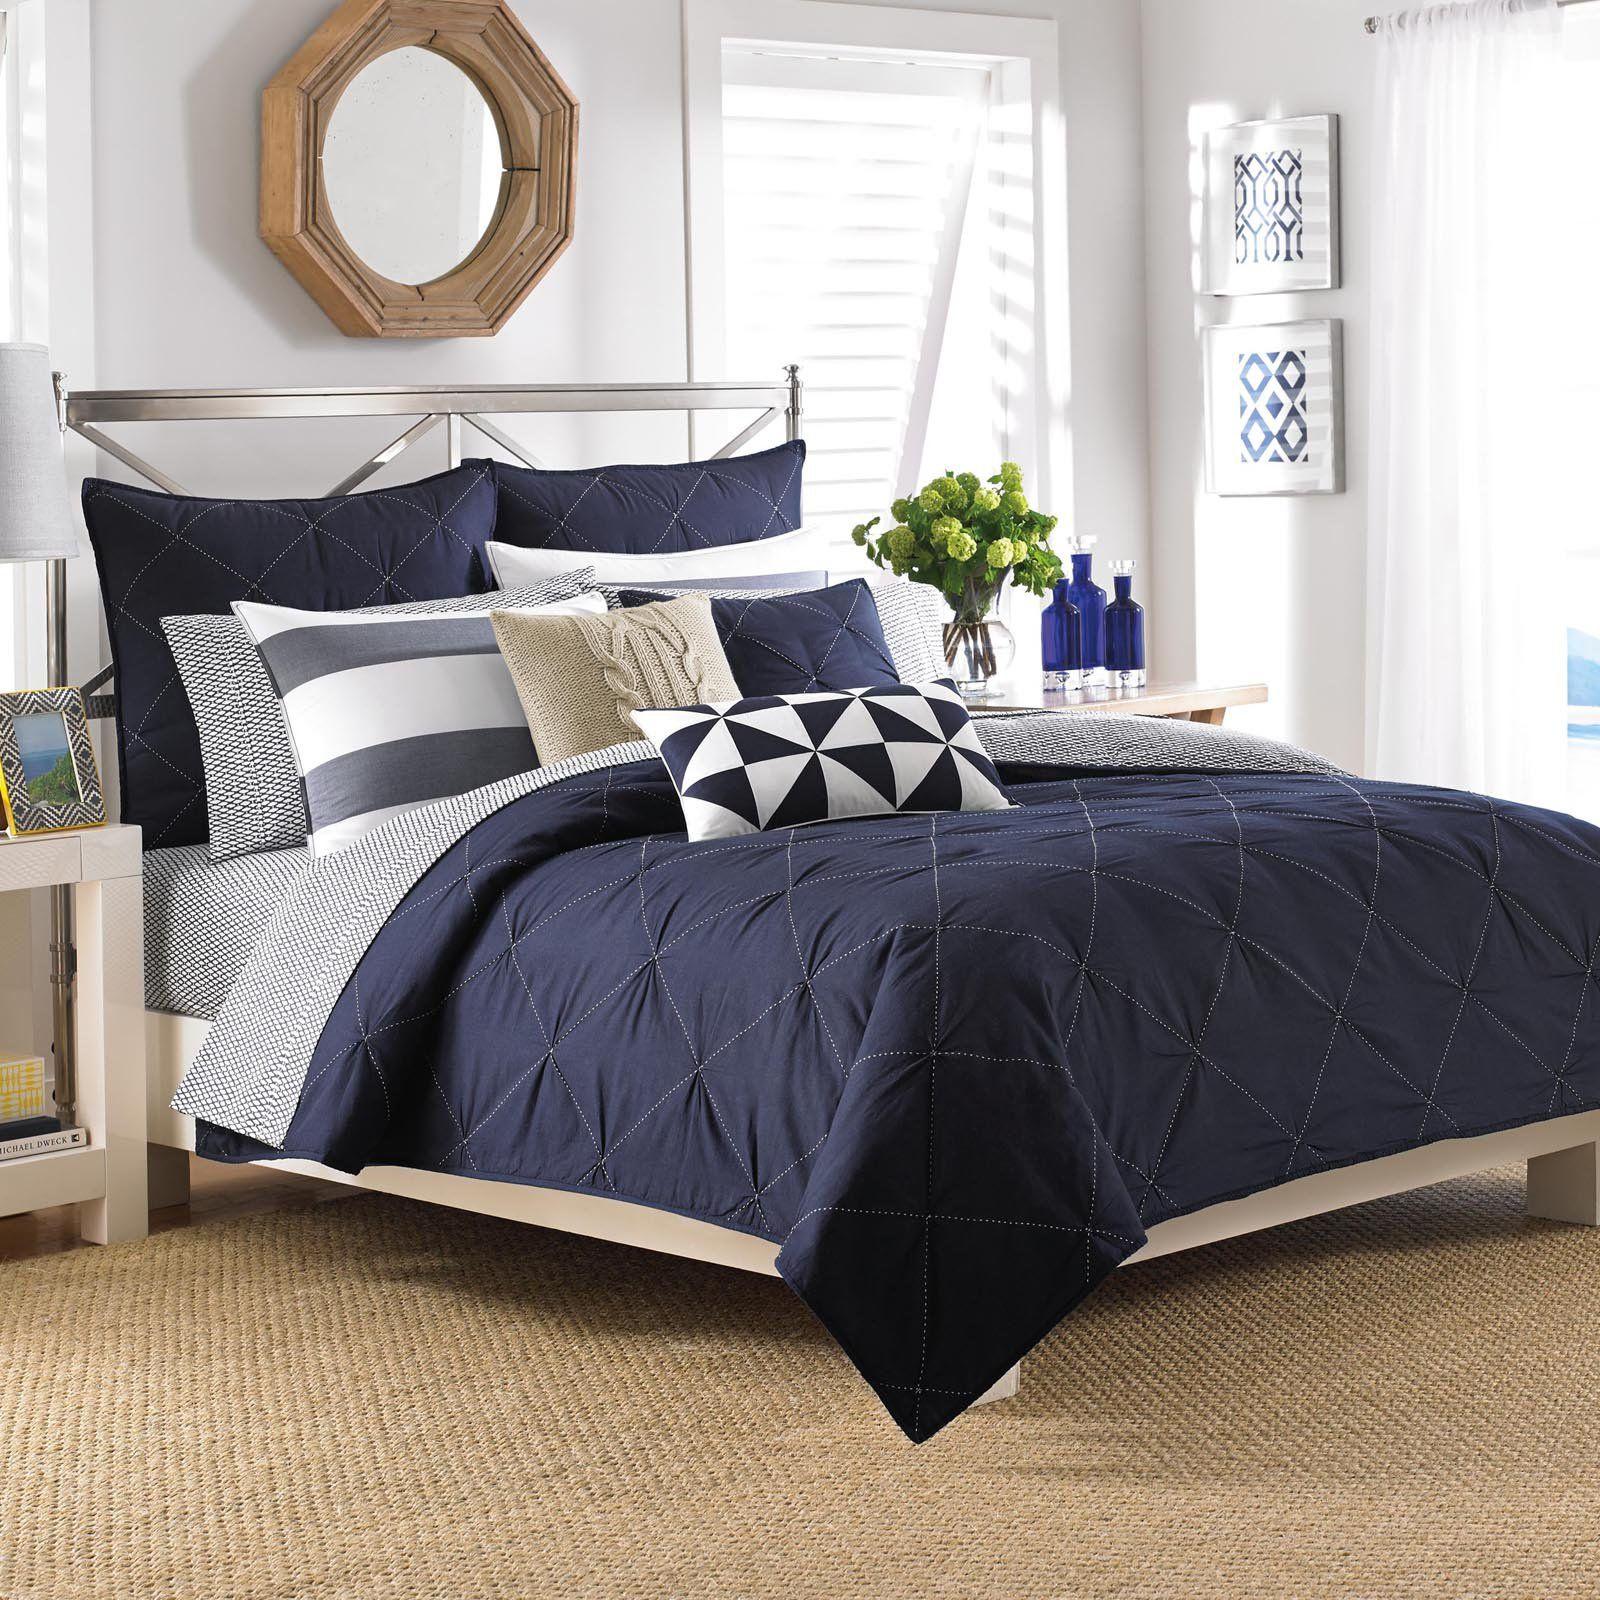 Nautica Lawndale Navy Duvet Cover Set In 2019 Bedding Master Bedroom Blue Master Bedroom Nautical Bedroom